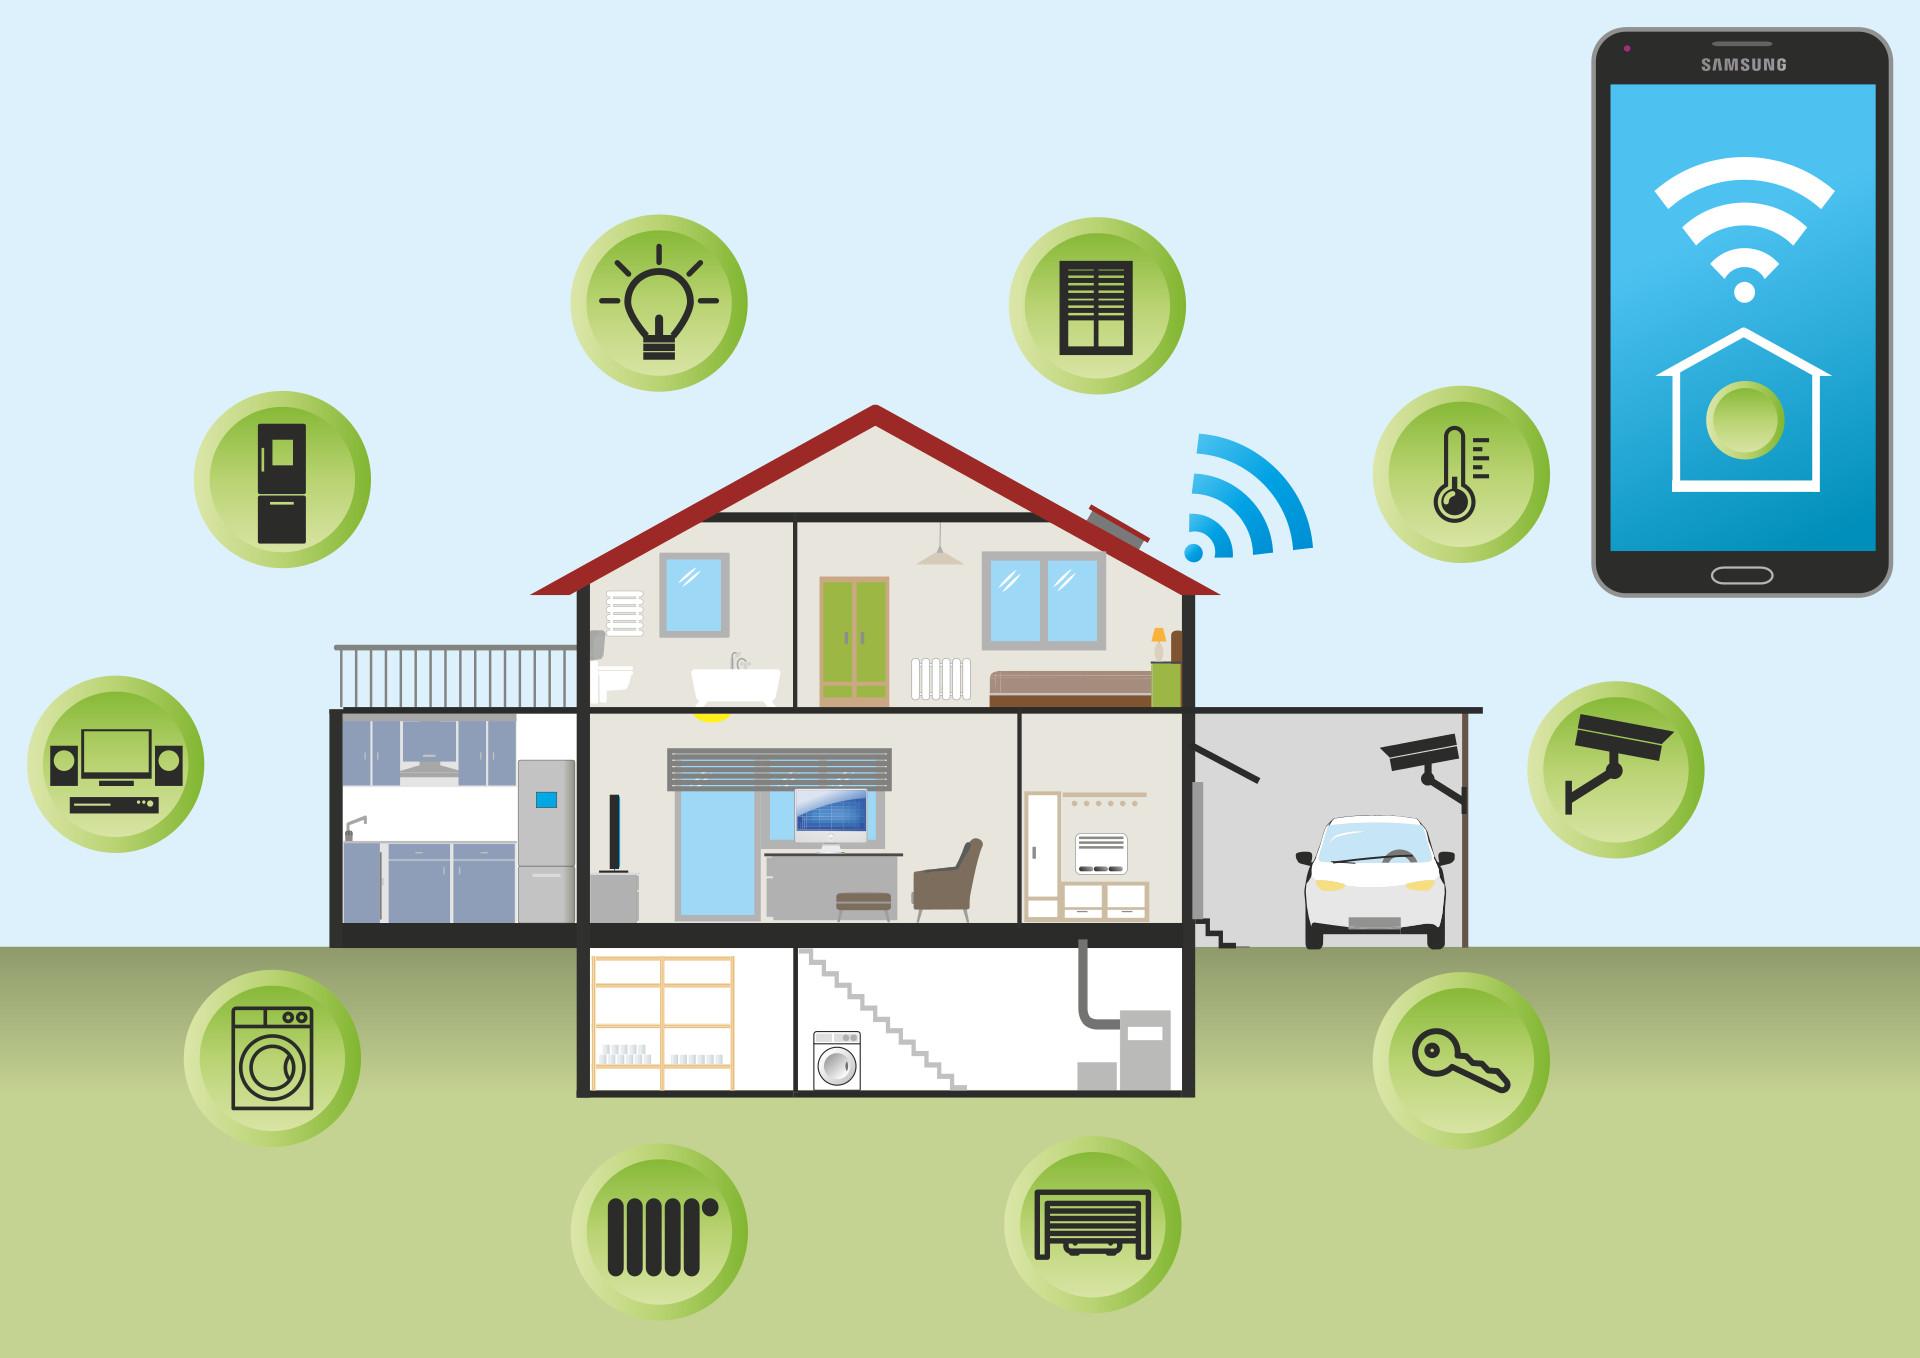 smart home so funktioniert das vernetze zuhause baukram. Black Bedroom Furniture Sets. Home Design Ideas